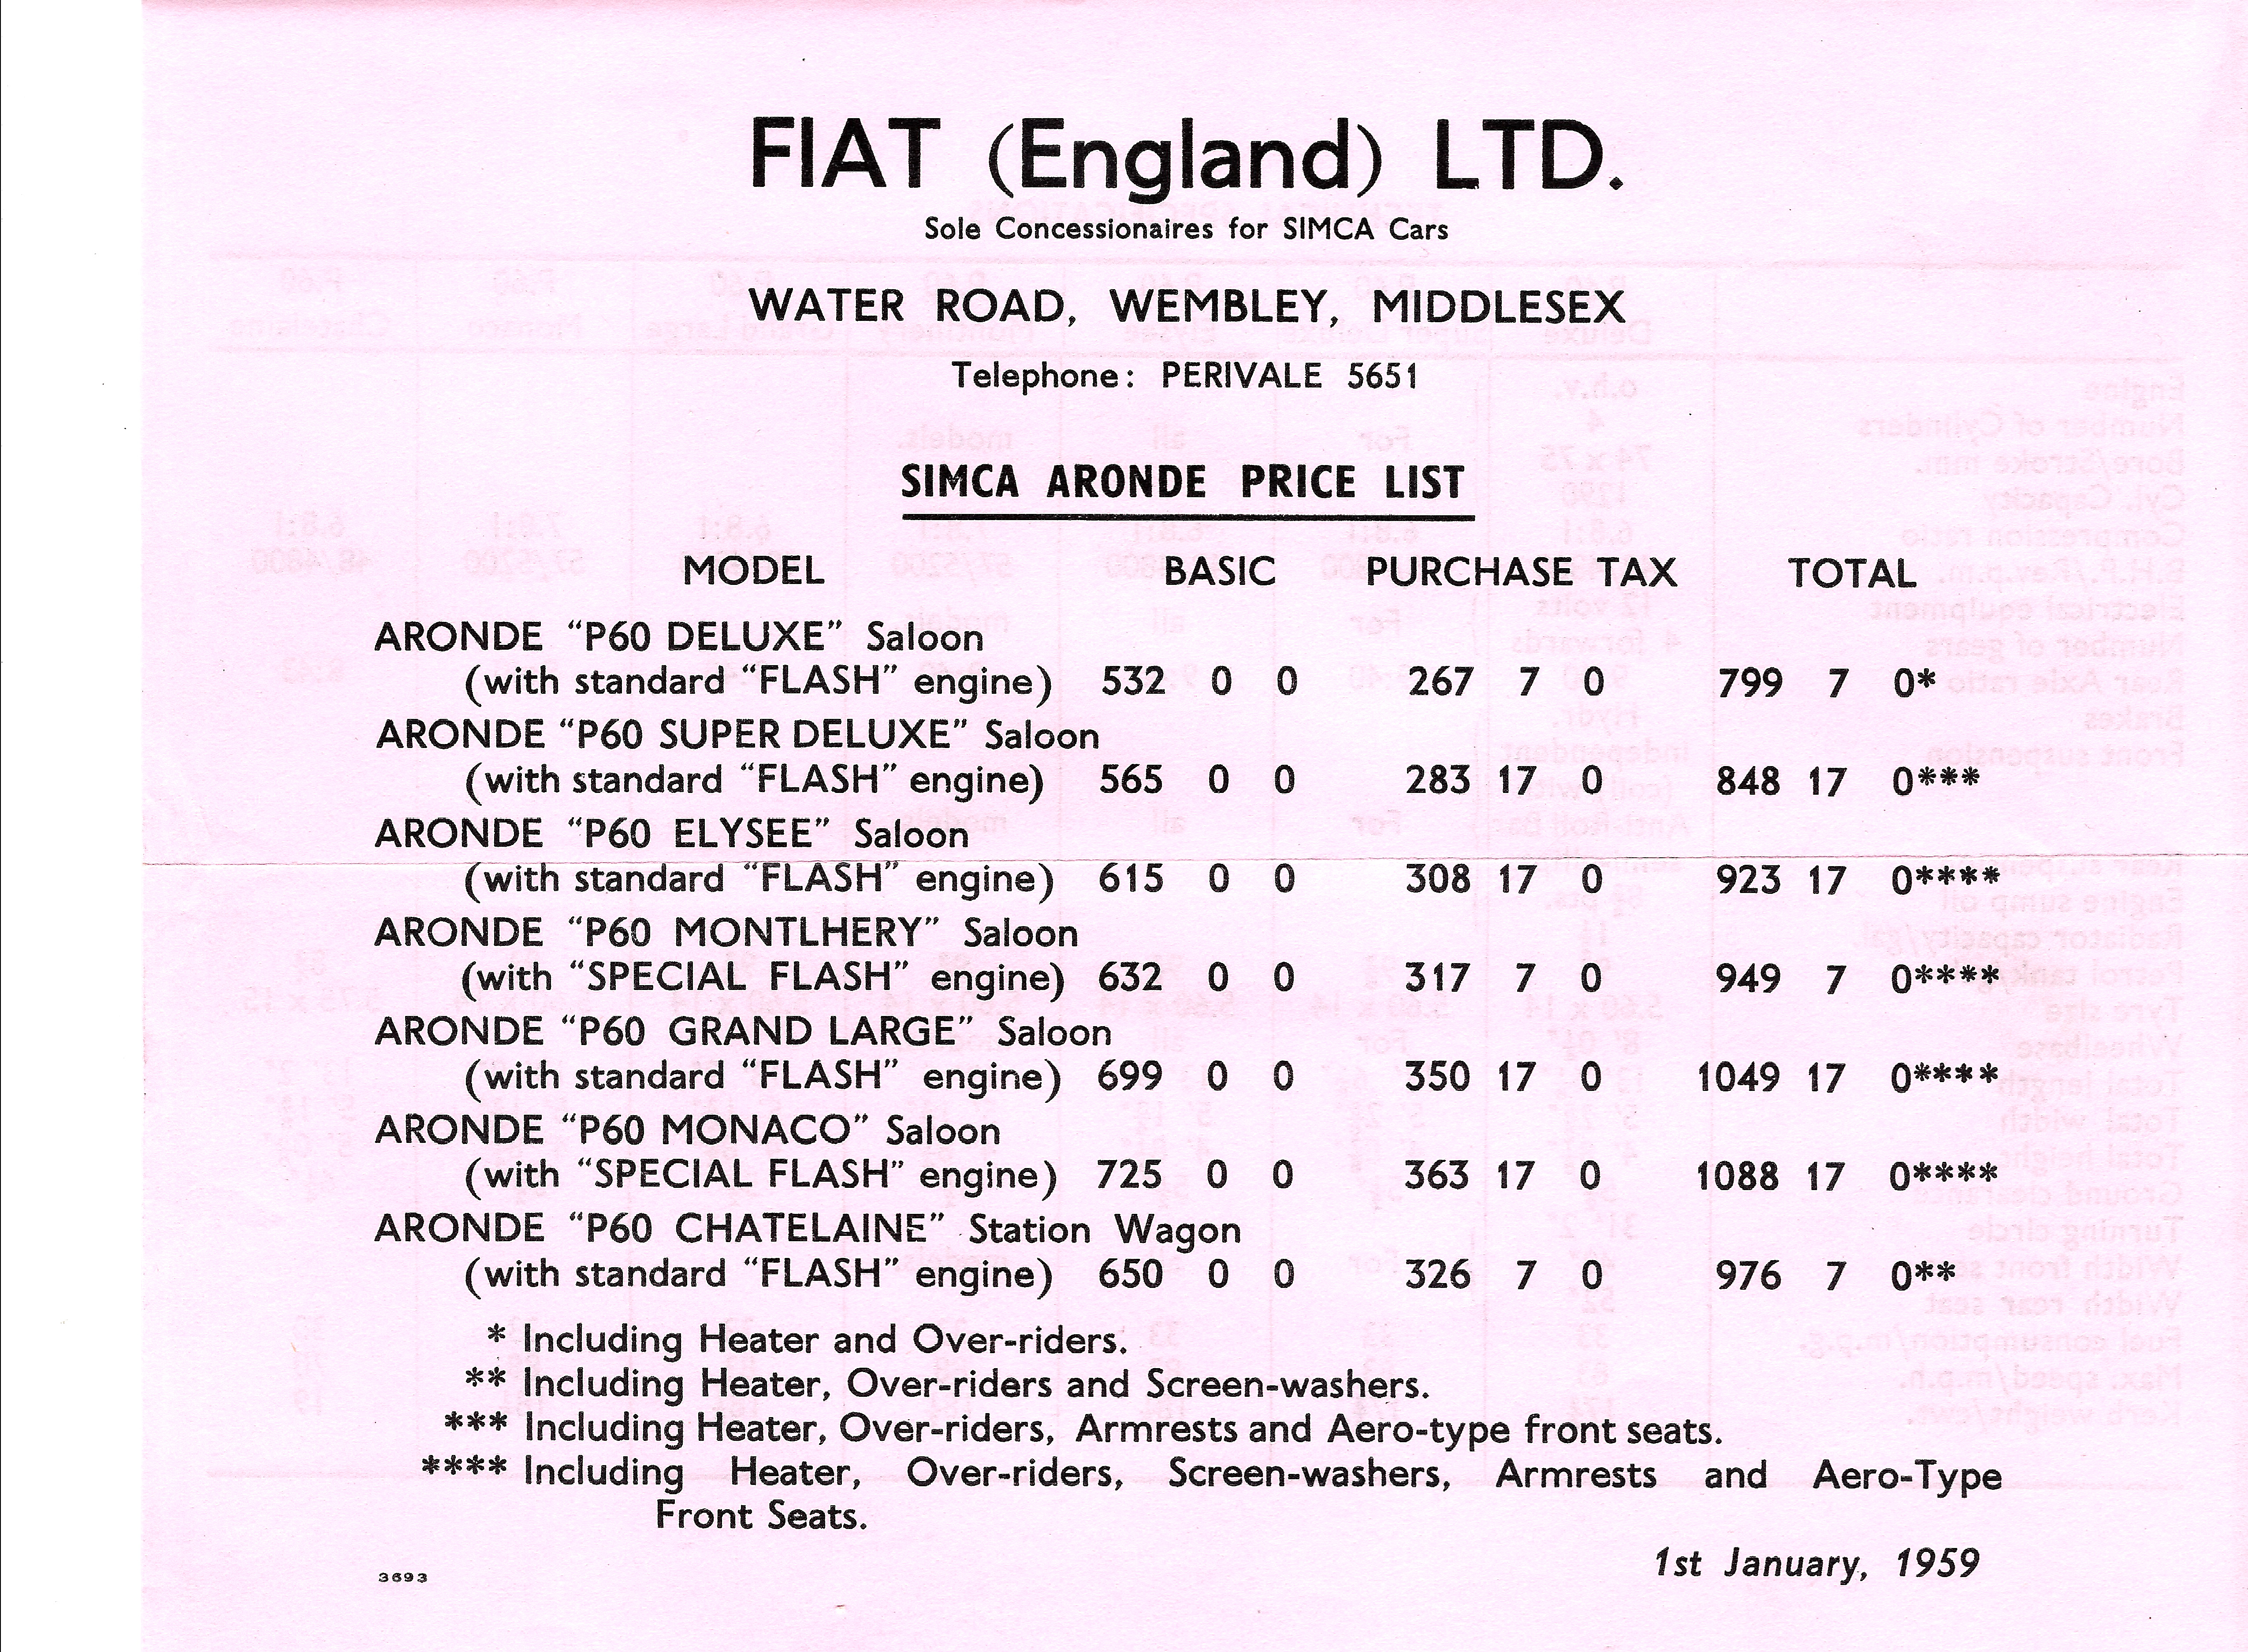 1959 Price List